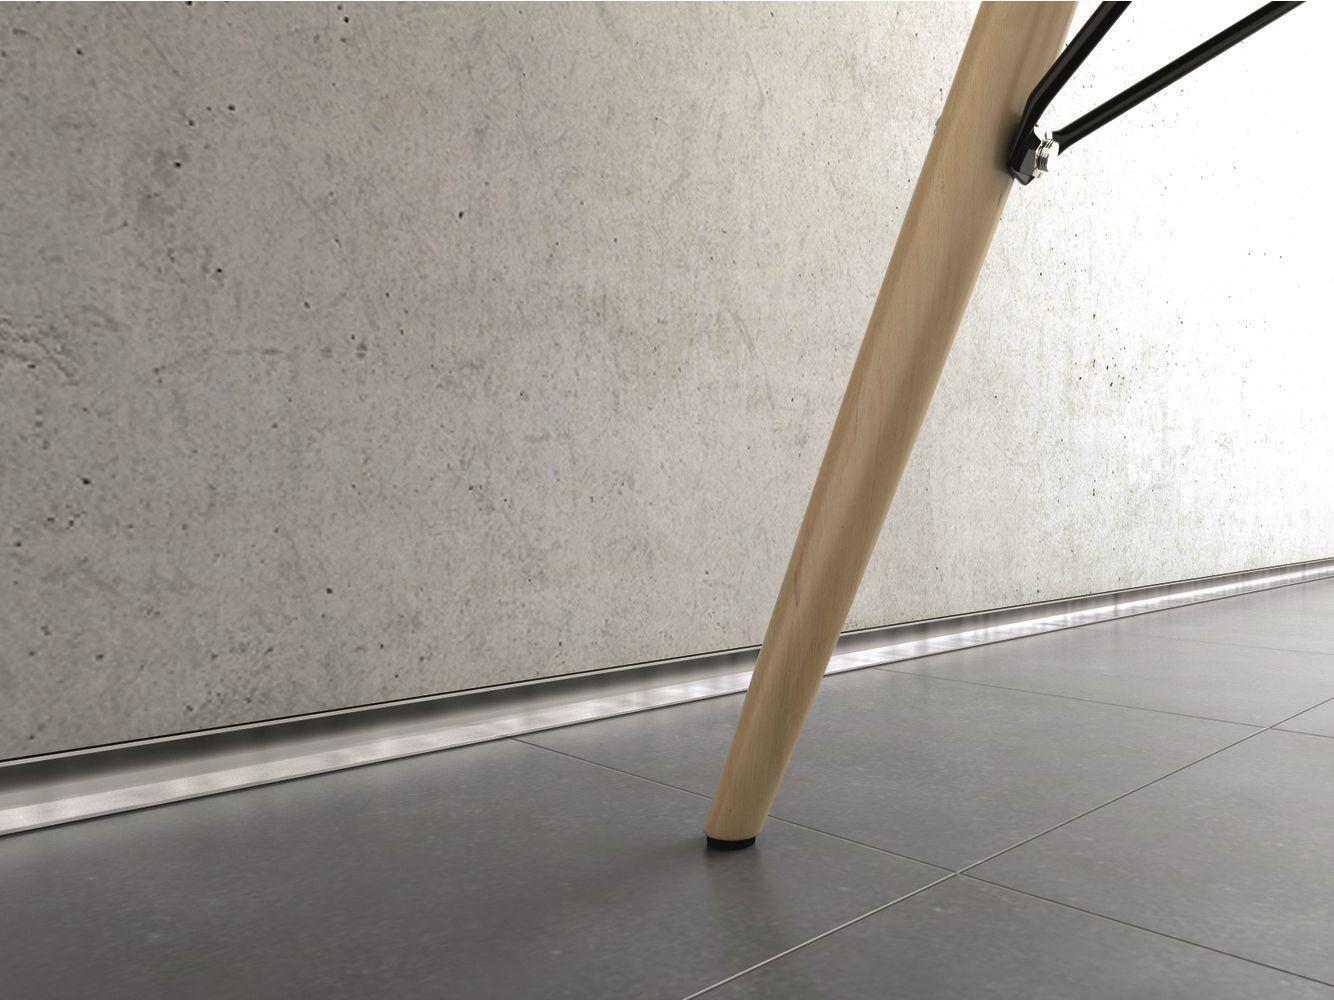 Decorative aluminium edge profile for floors METAL LINE AF by PROFILPAS